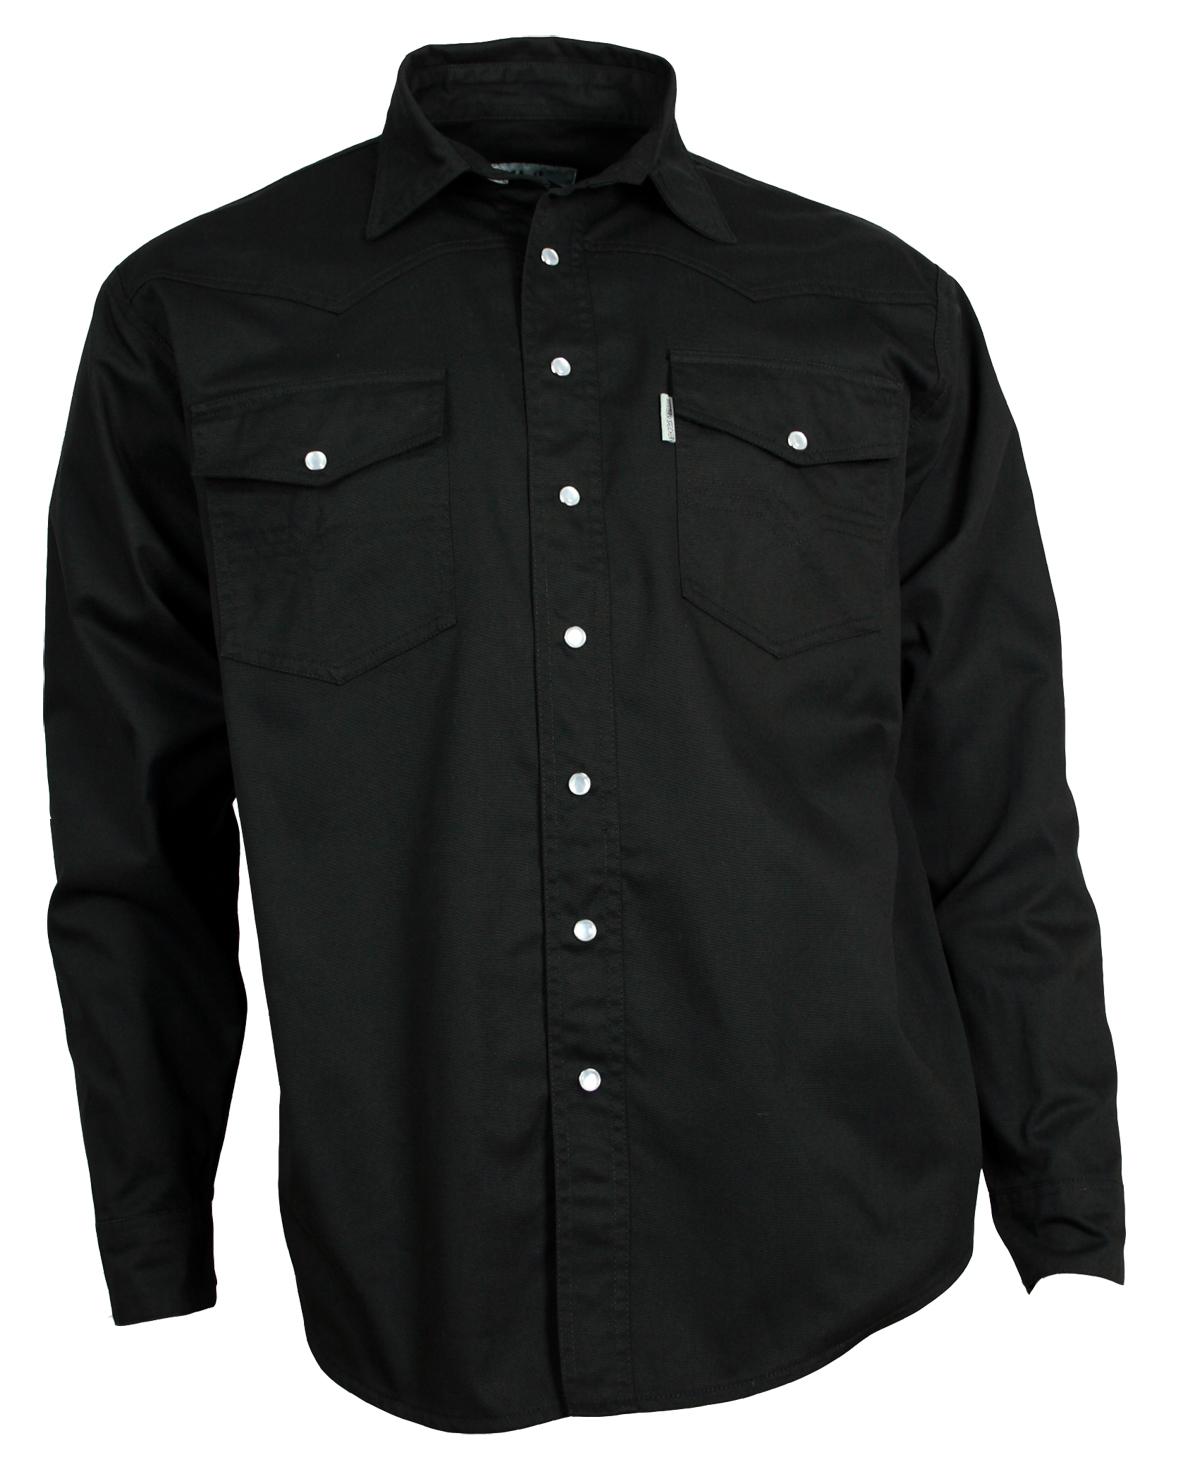 jeansartikel lederartikel strassartikel online kaufen jeanshemd arizona schwarz. Black Bedroom Furniture Sets. Home Design Ideas